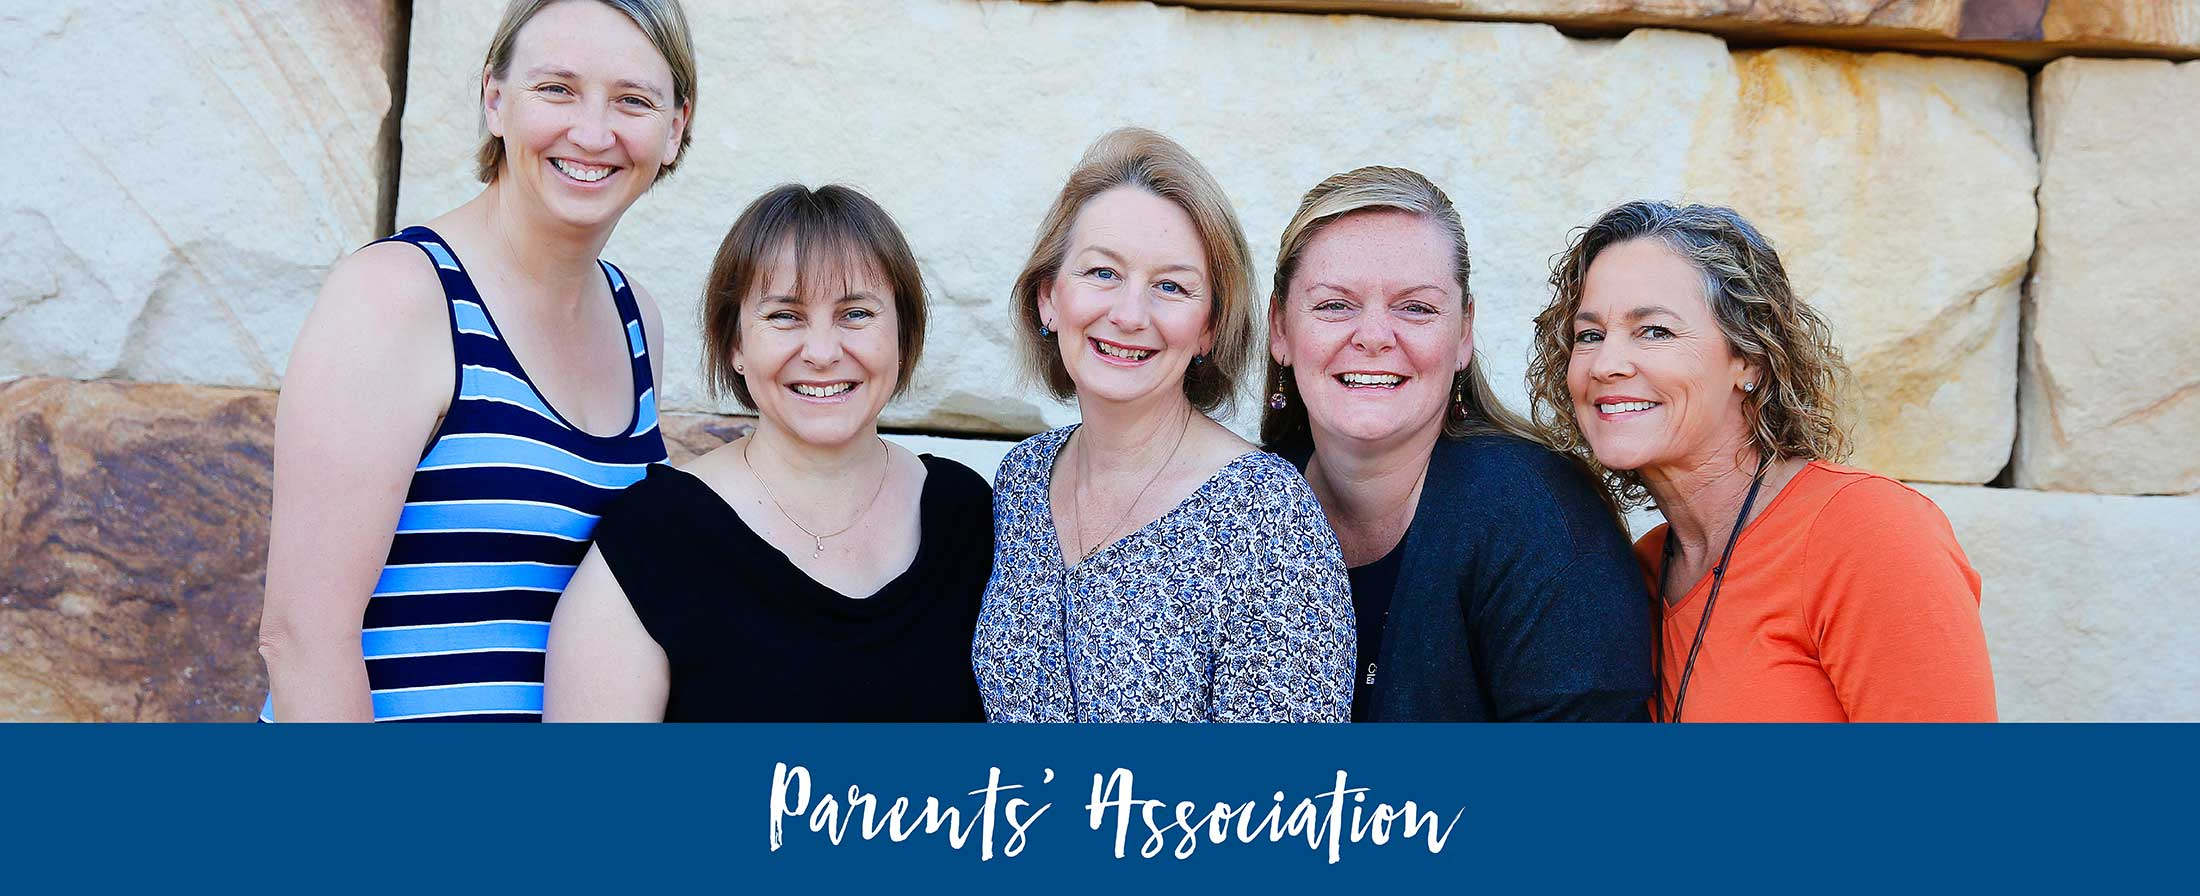 charlton christian college parents association p and c